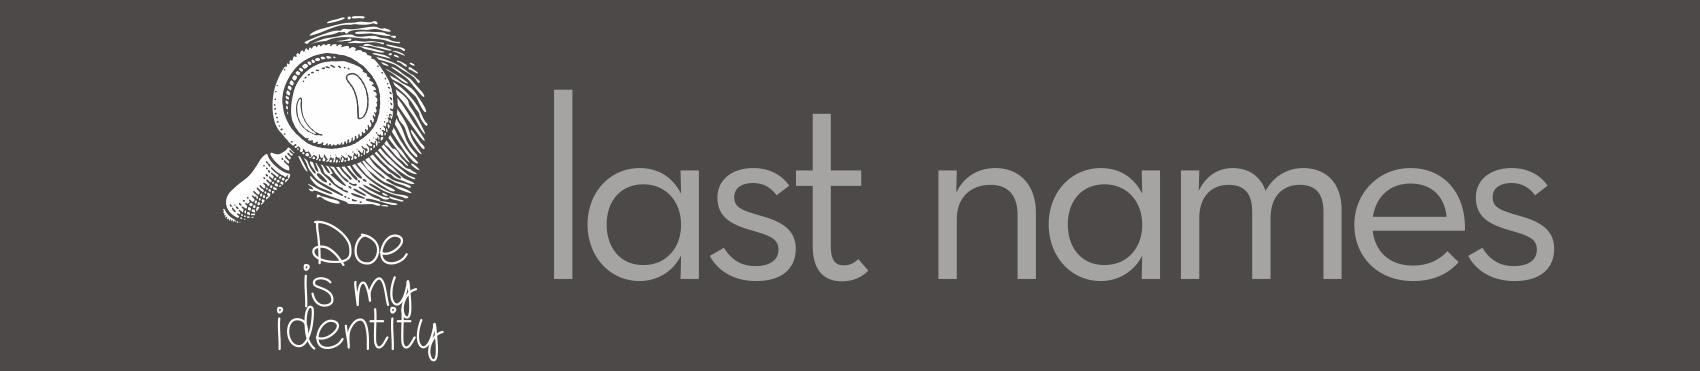 Last Names logo ideas